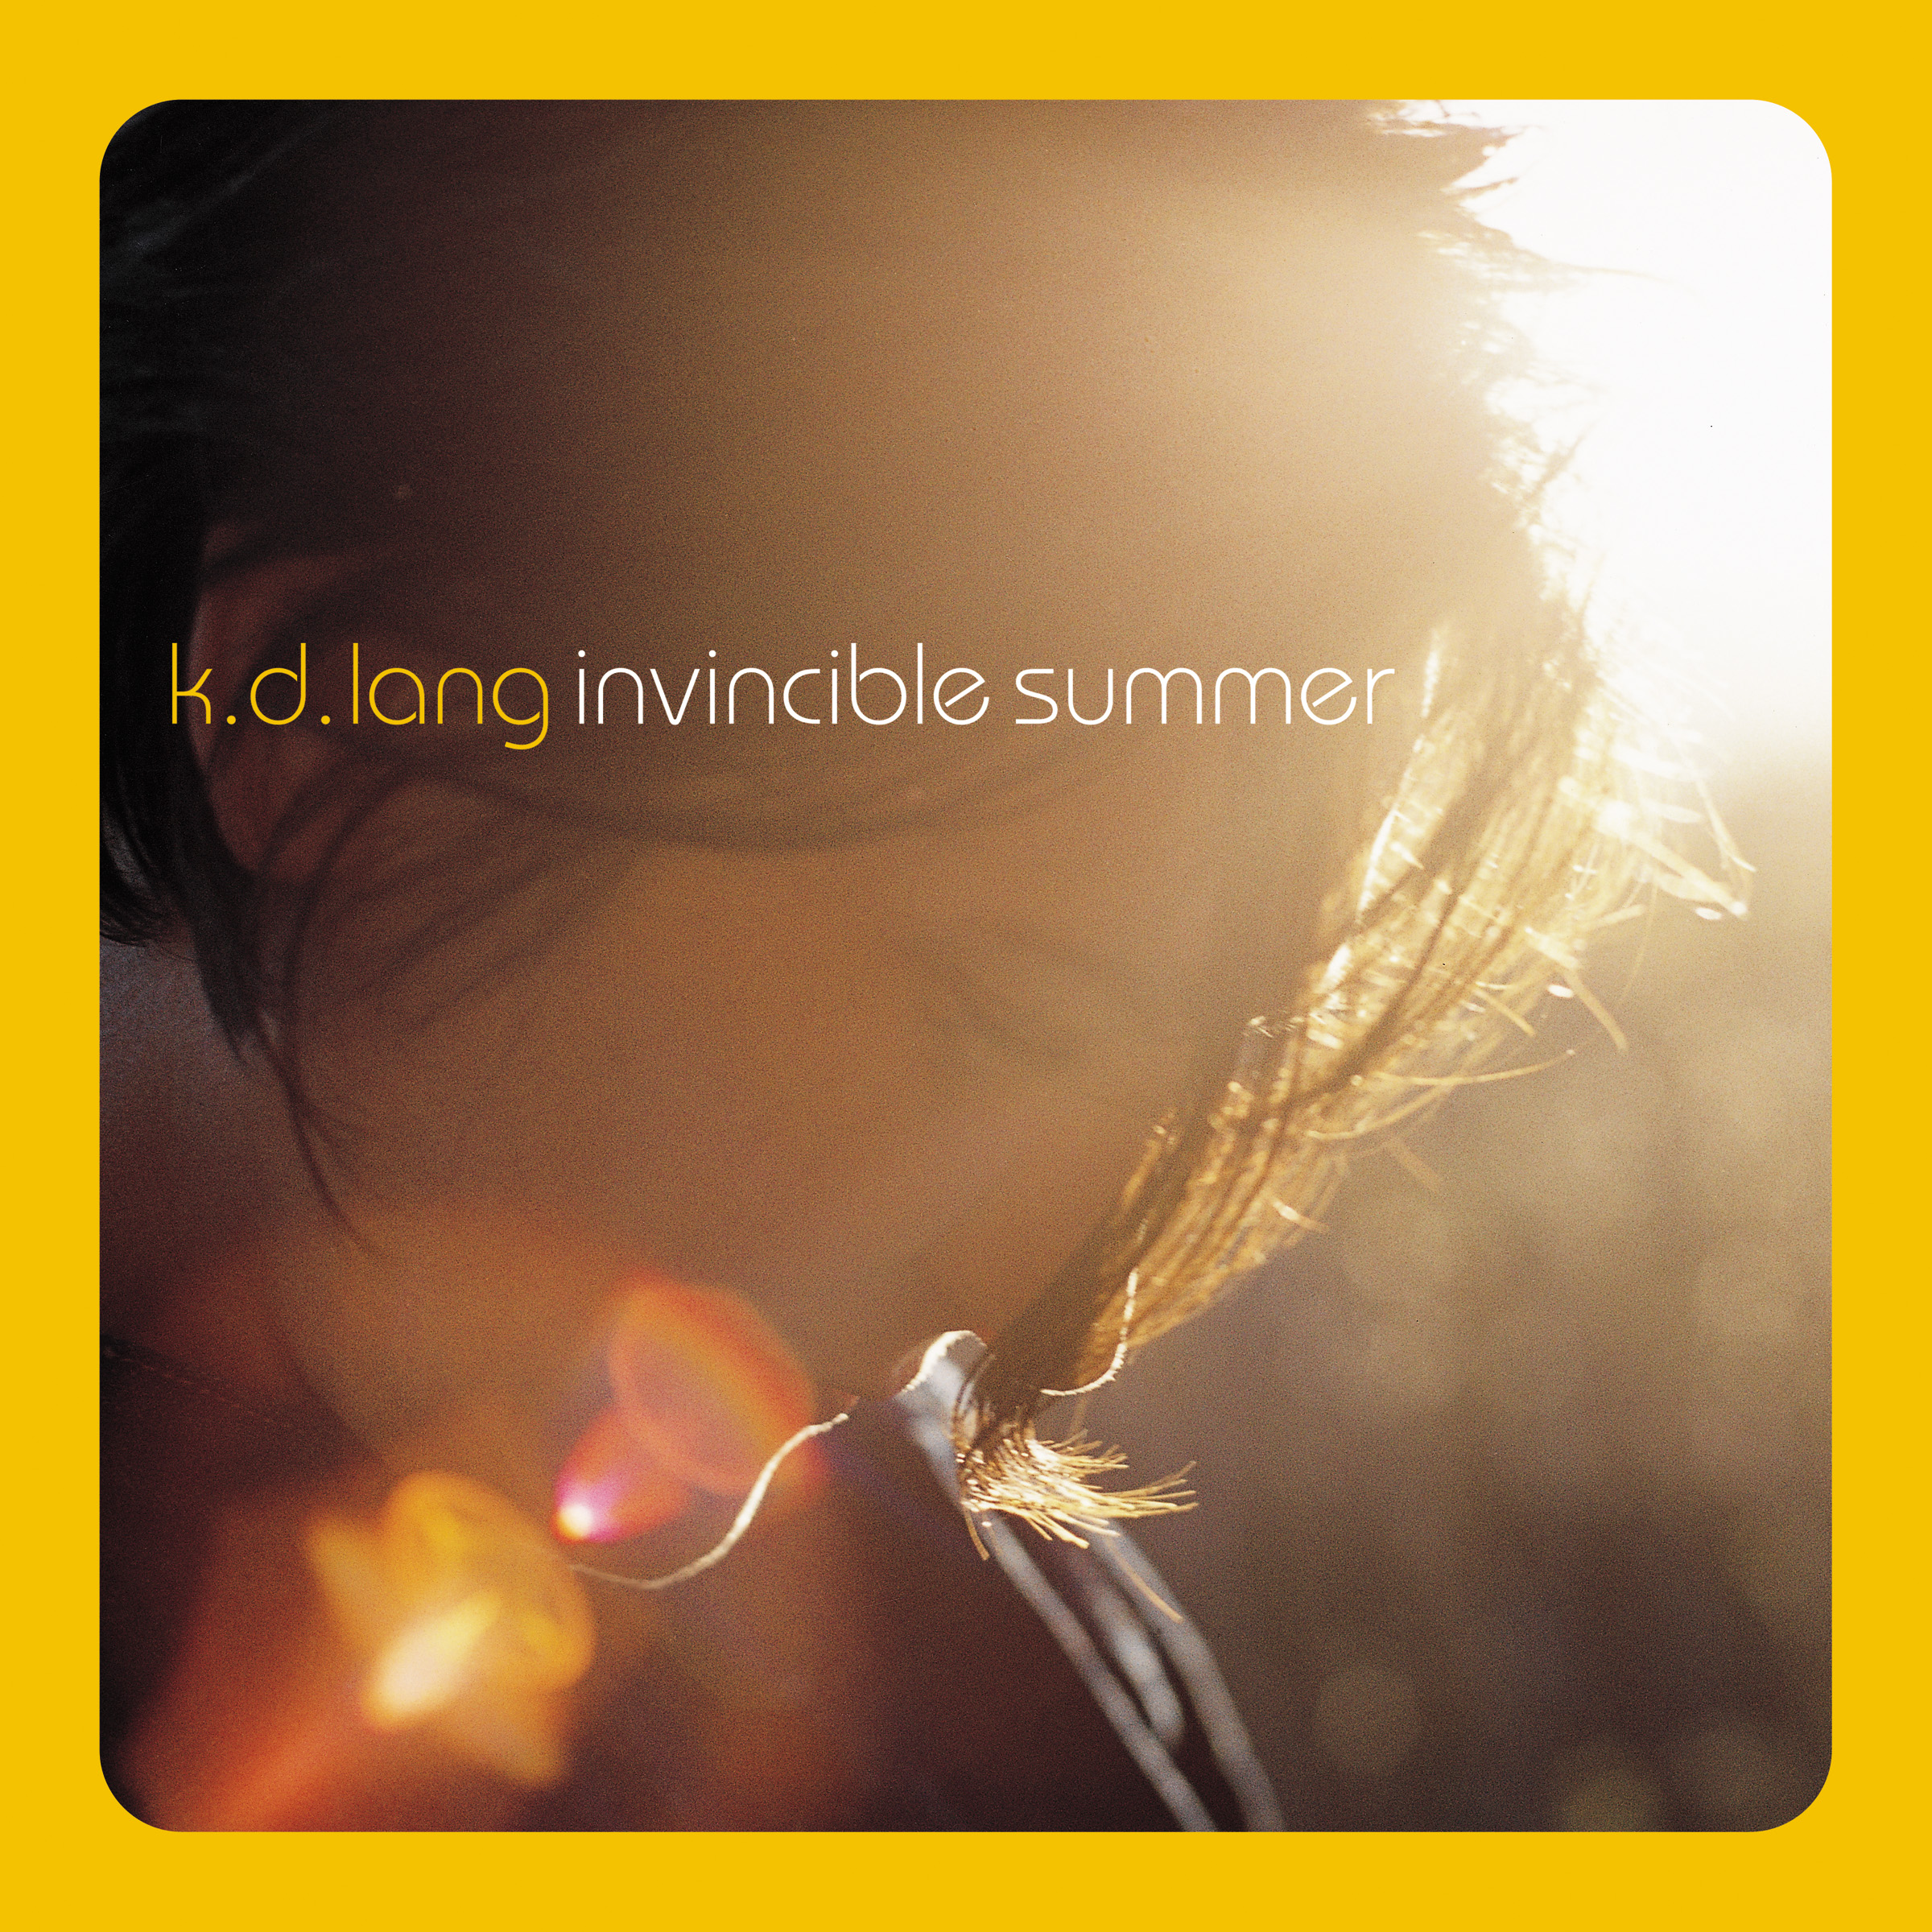 KD_invincible summer_cover.jpg